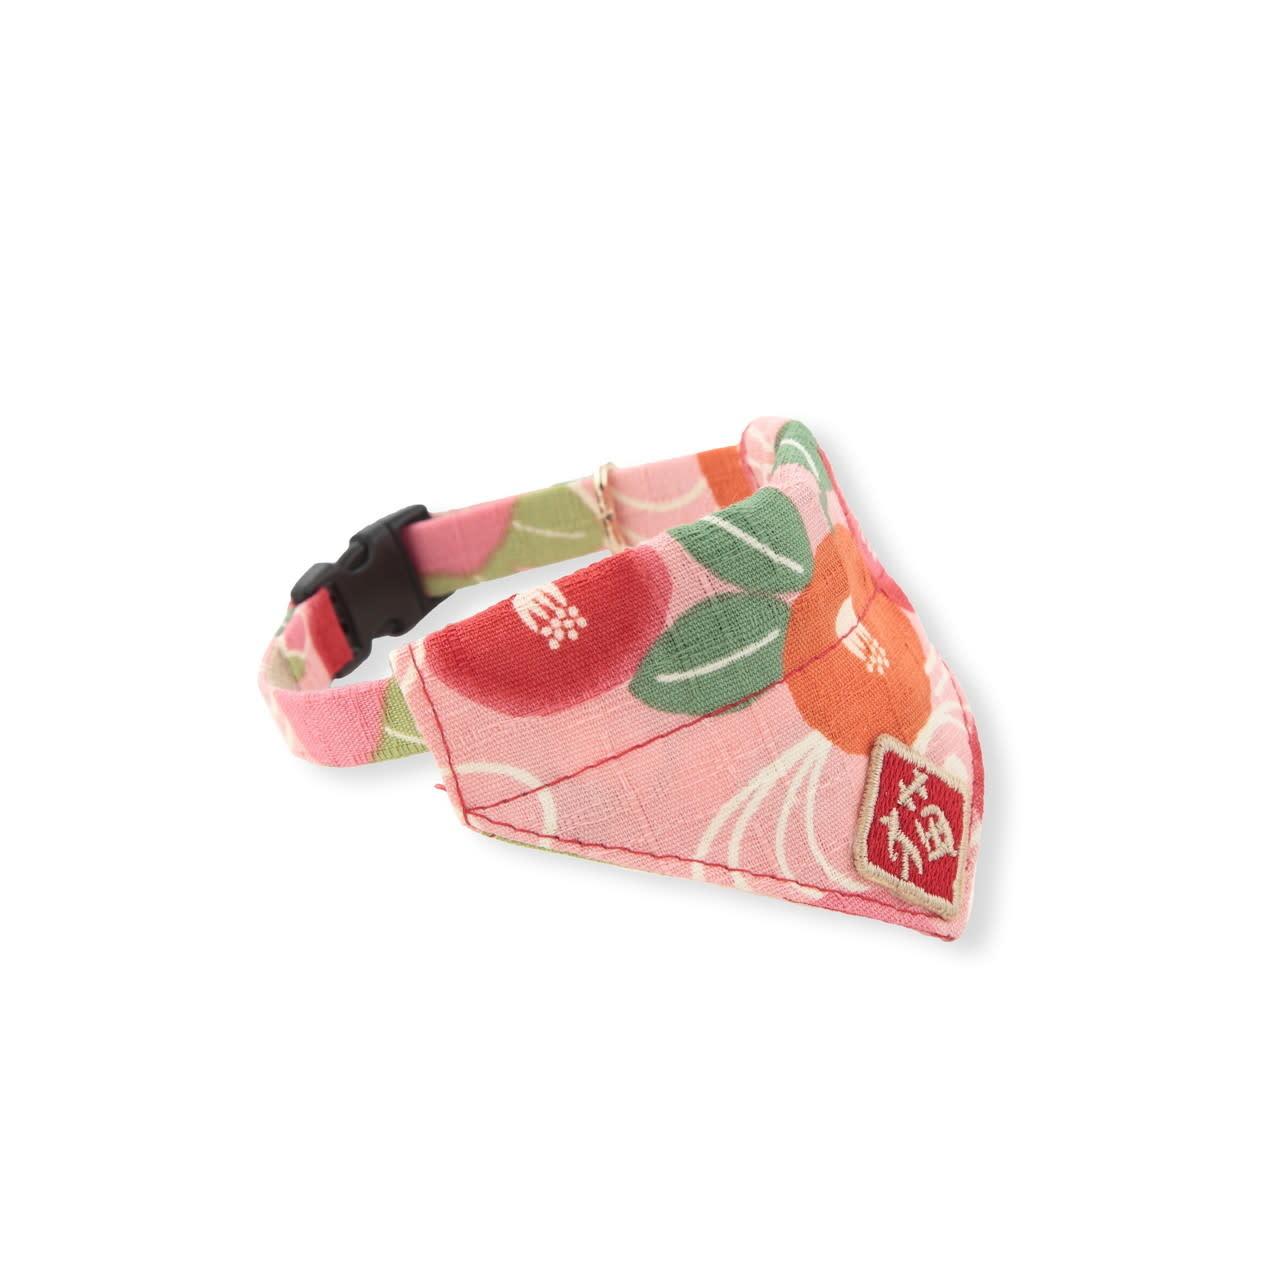 Necoichi Kimono Cat Bandana Collar Pink